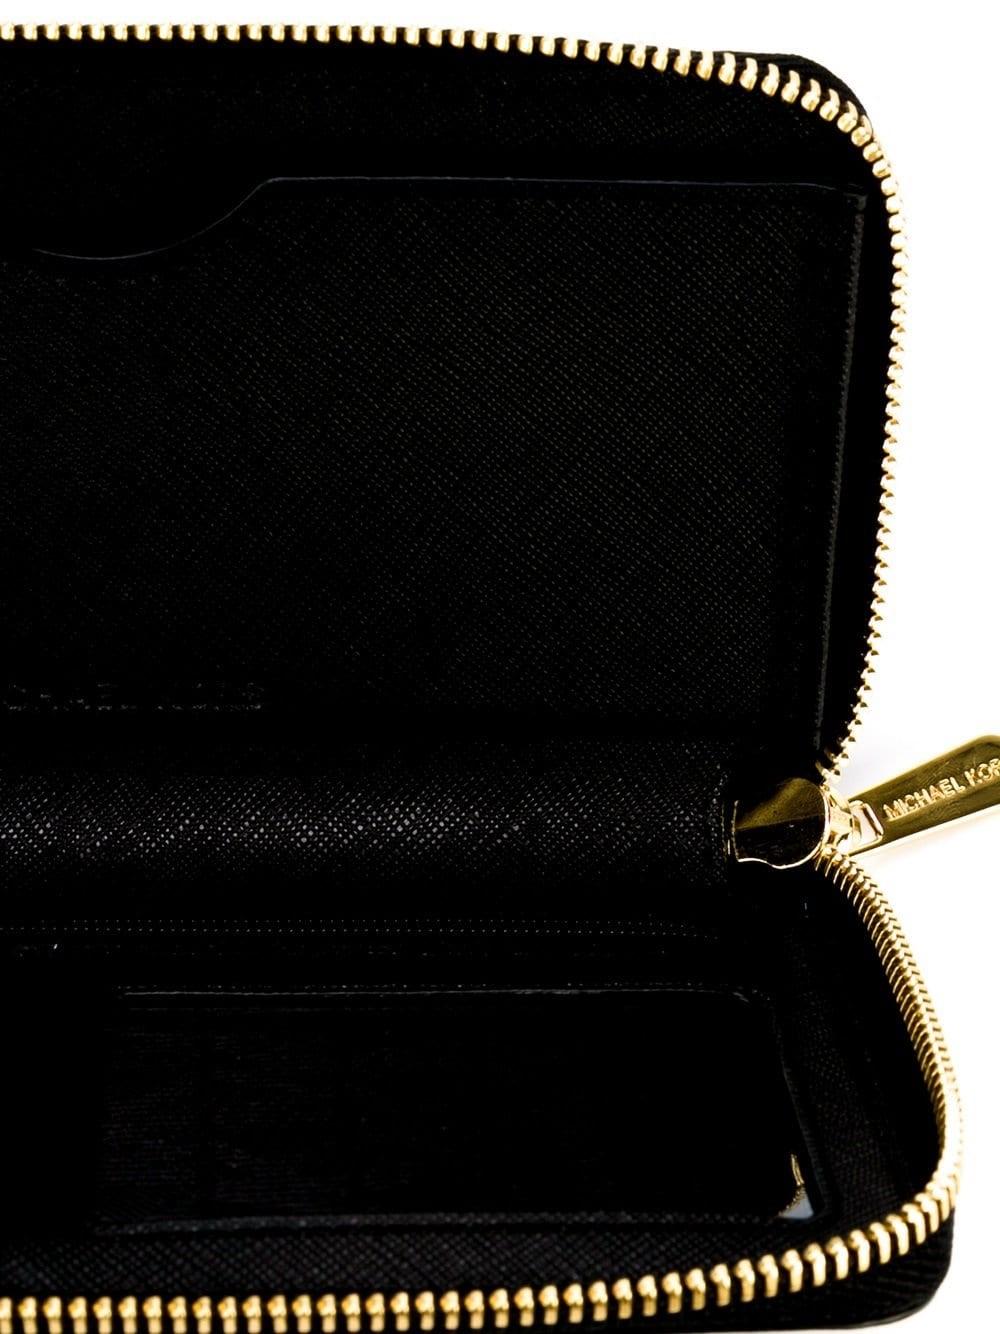 1e4e99c976ee9 michael kors mk LOGO WALLET available on montiboutique.com - 26434